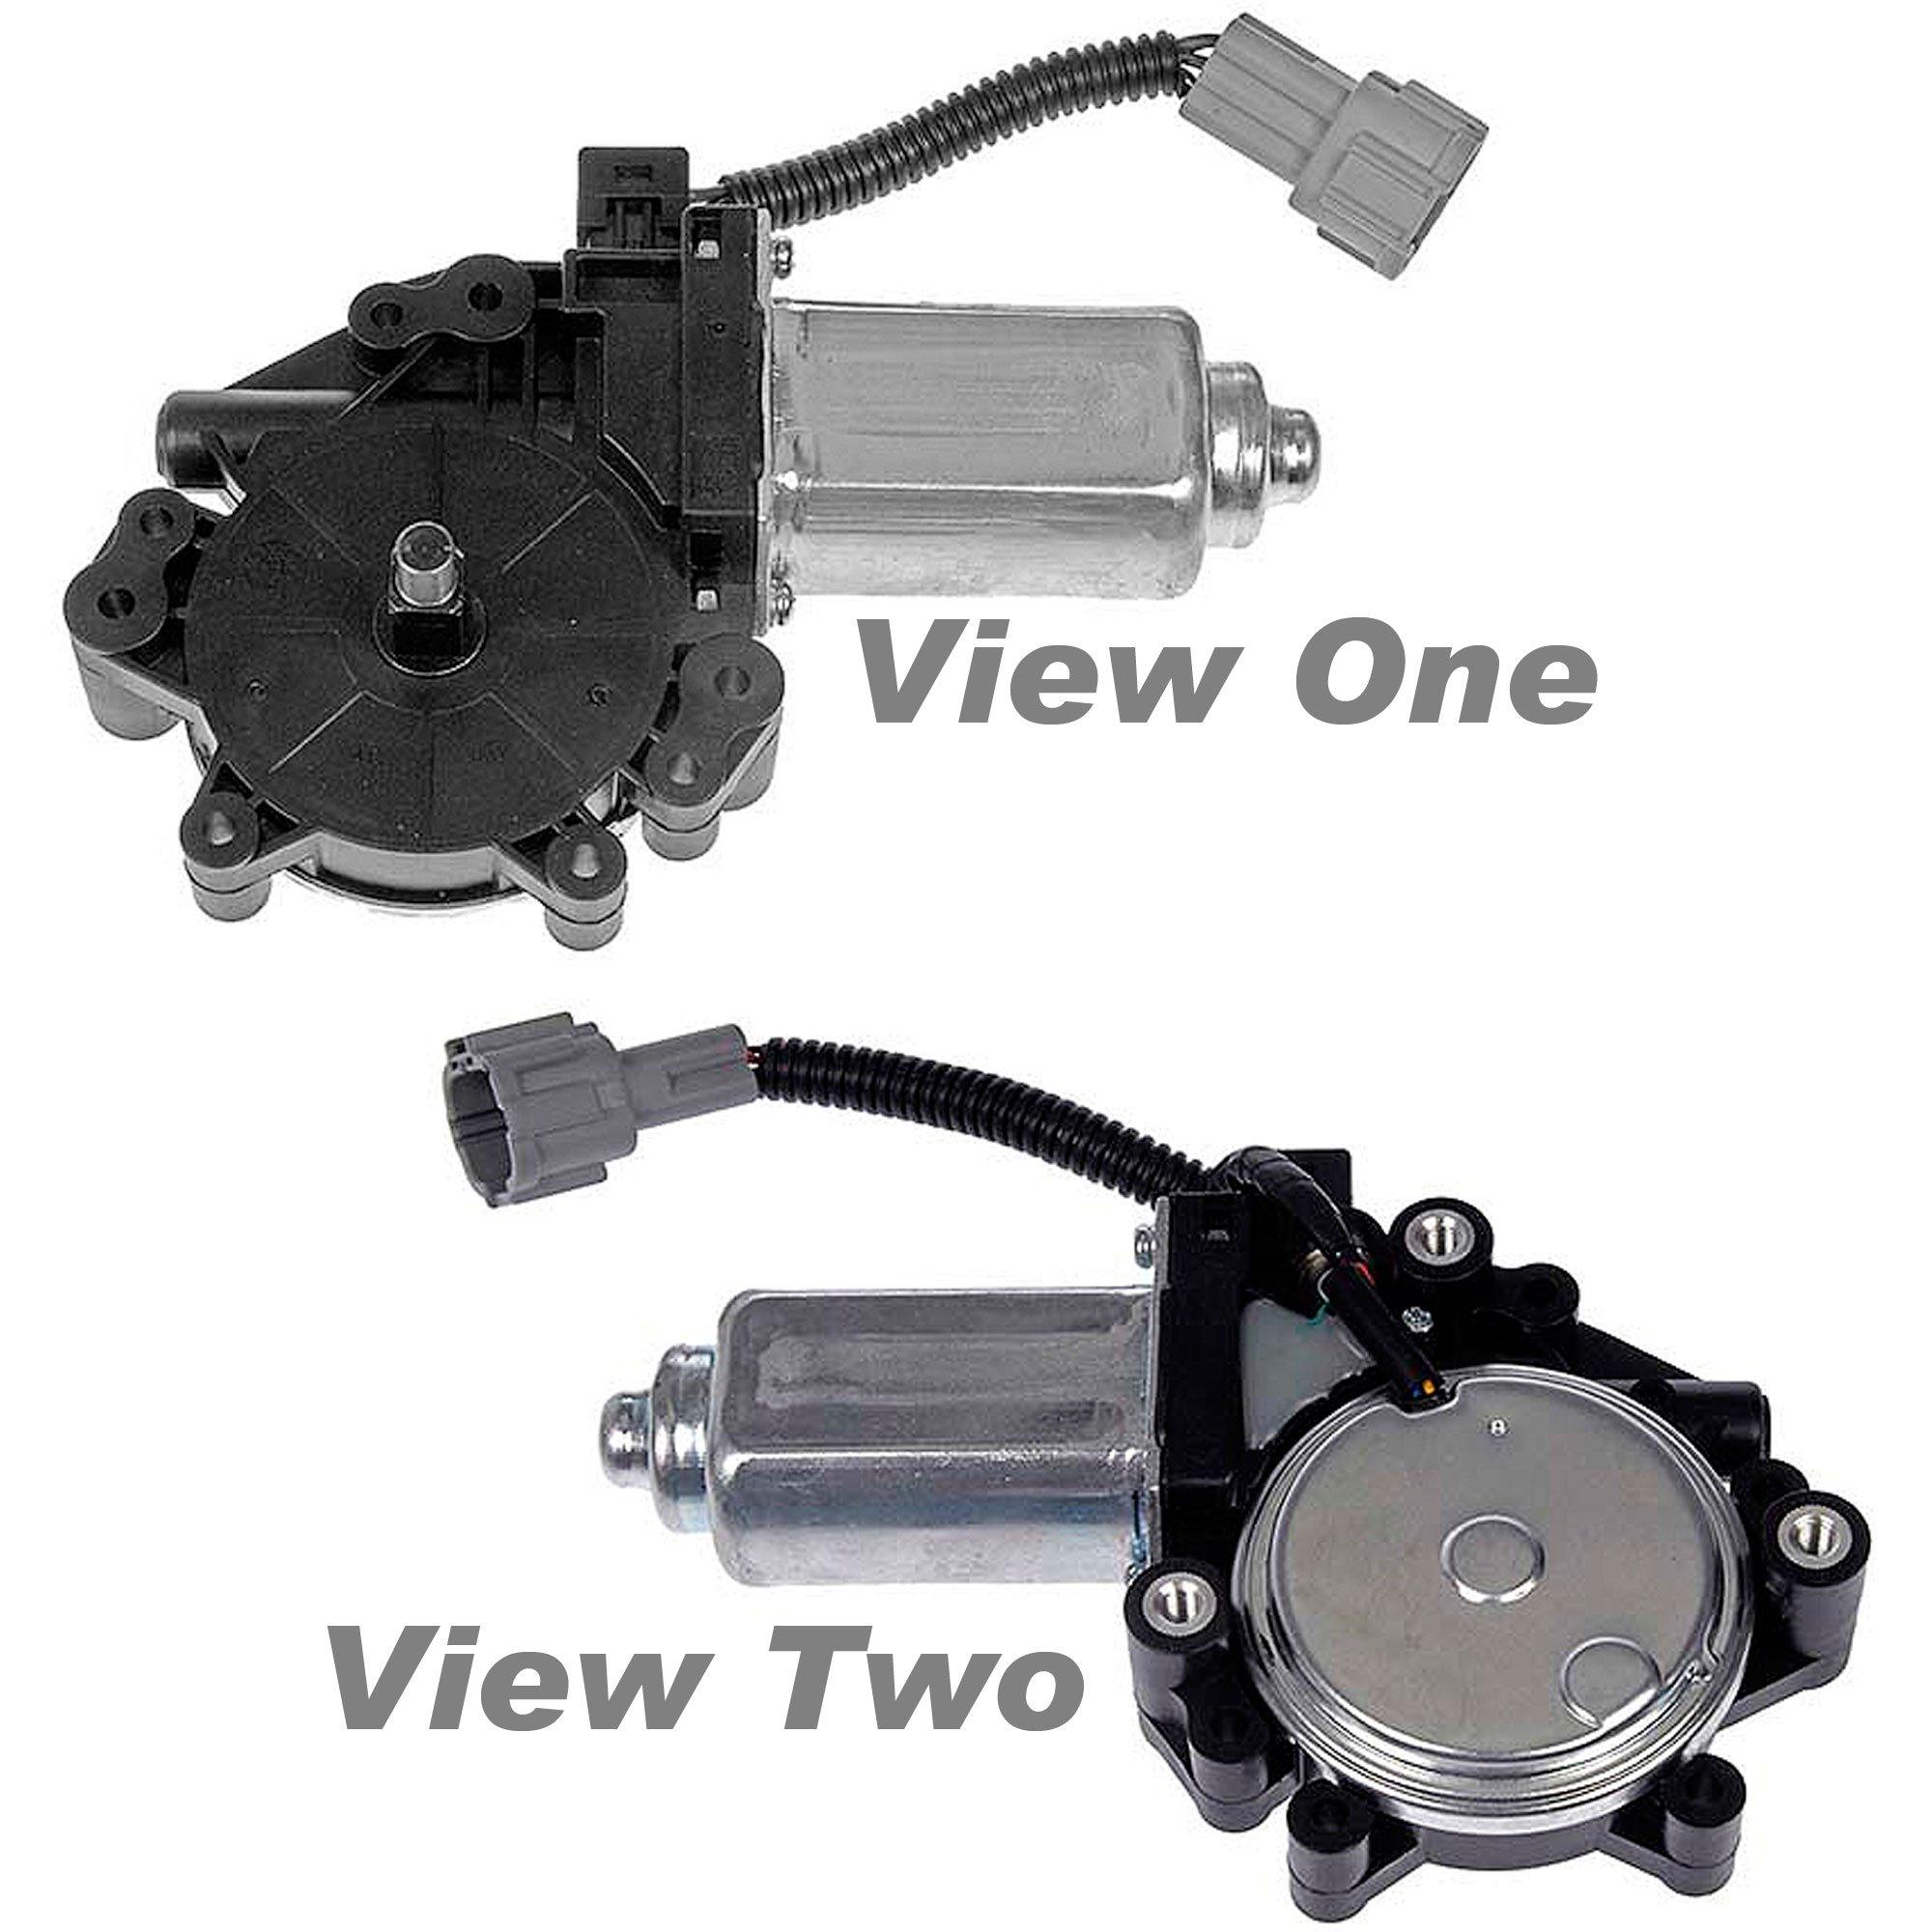 1 PCS Transmission Mount For 2004-2011 Nissan Titan 5.6L 2WD